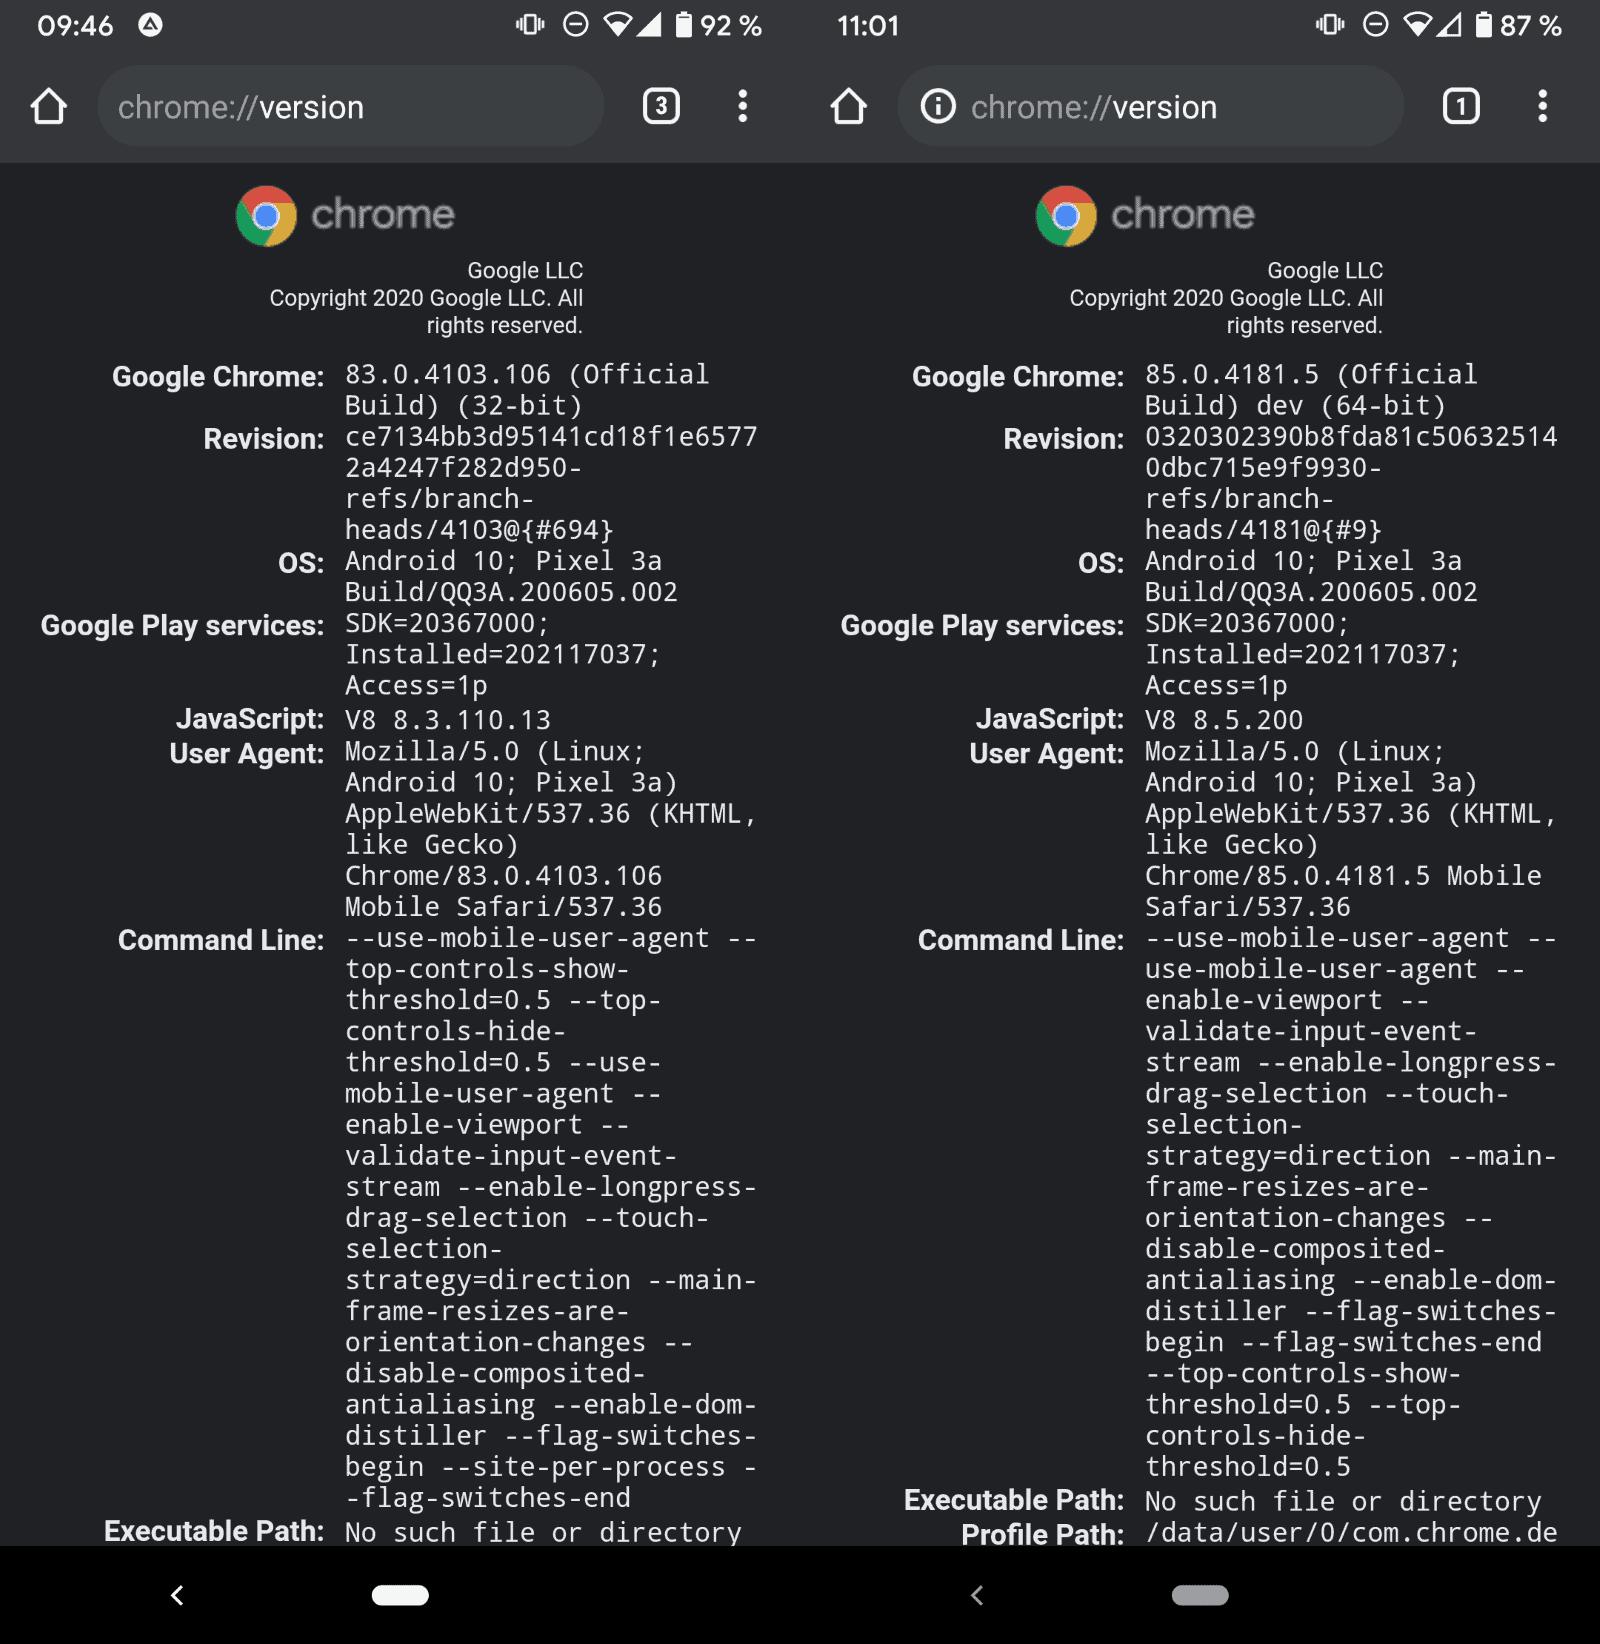 Google android chrome 64-bit version